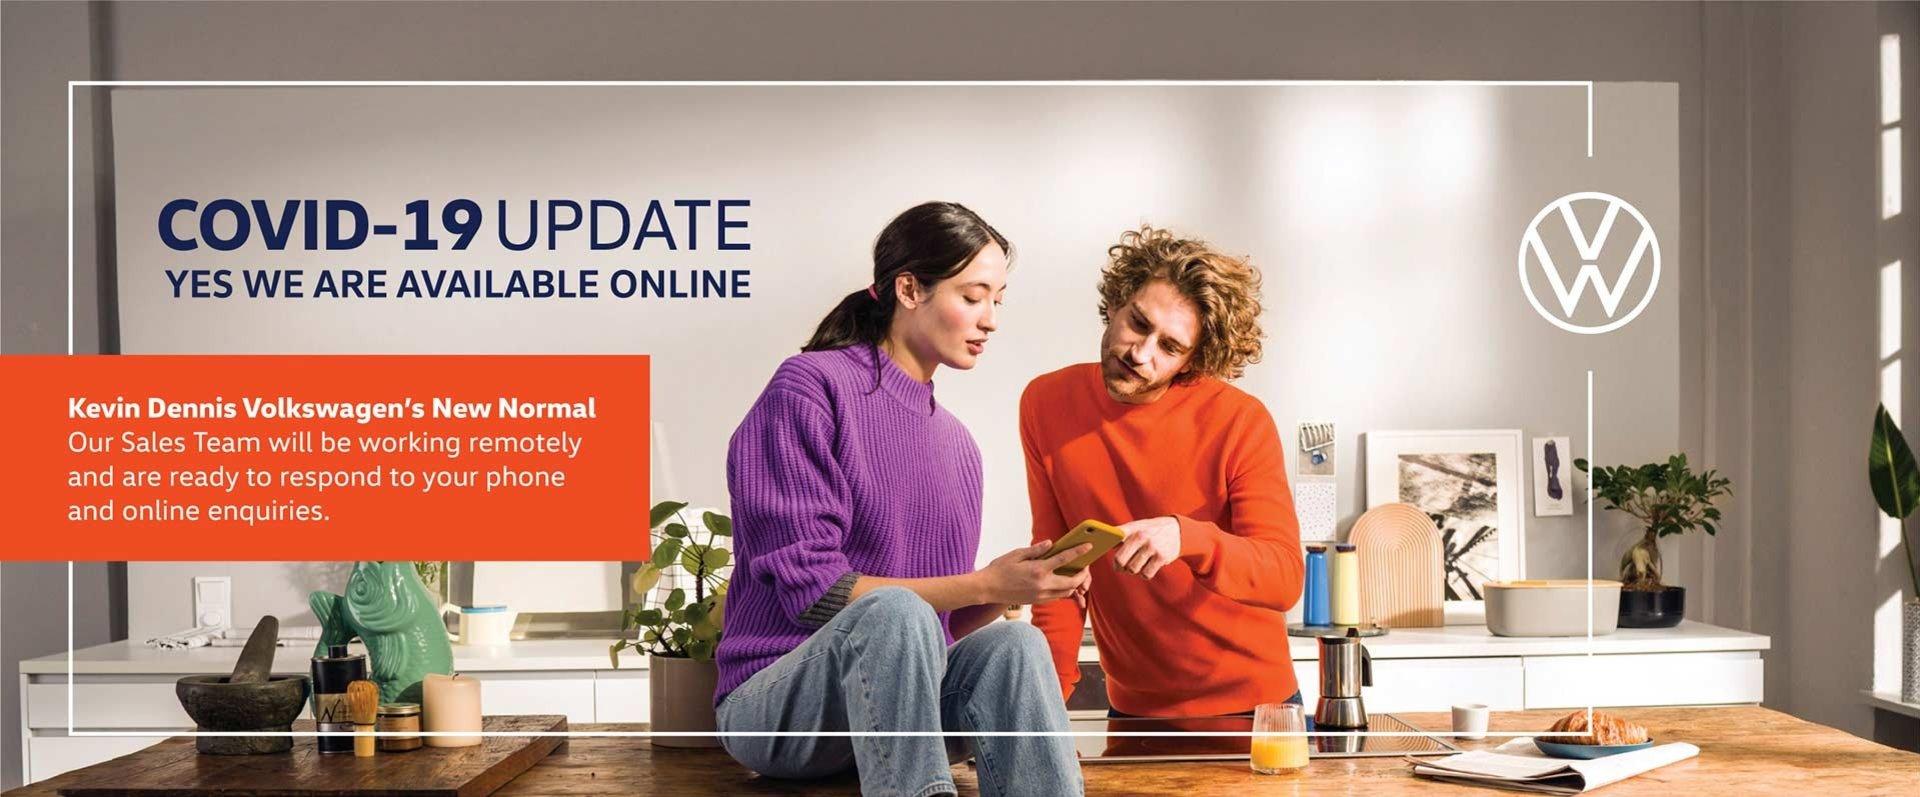 Kevin Dennis VW - Online Enquiries